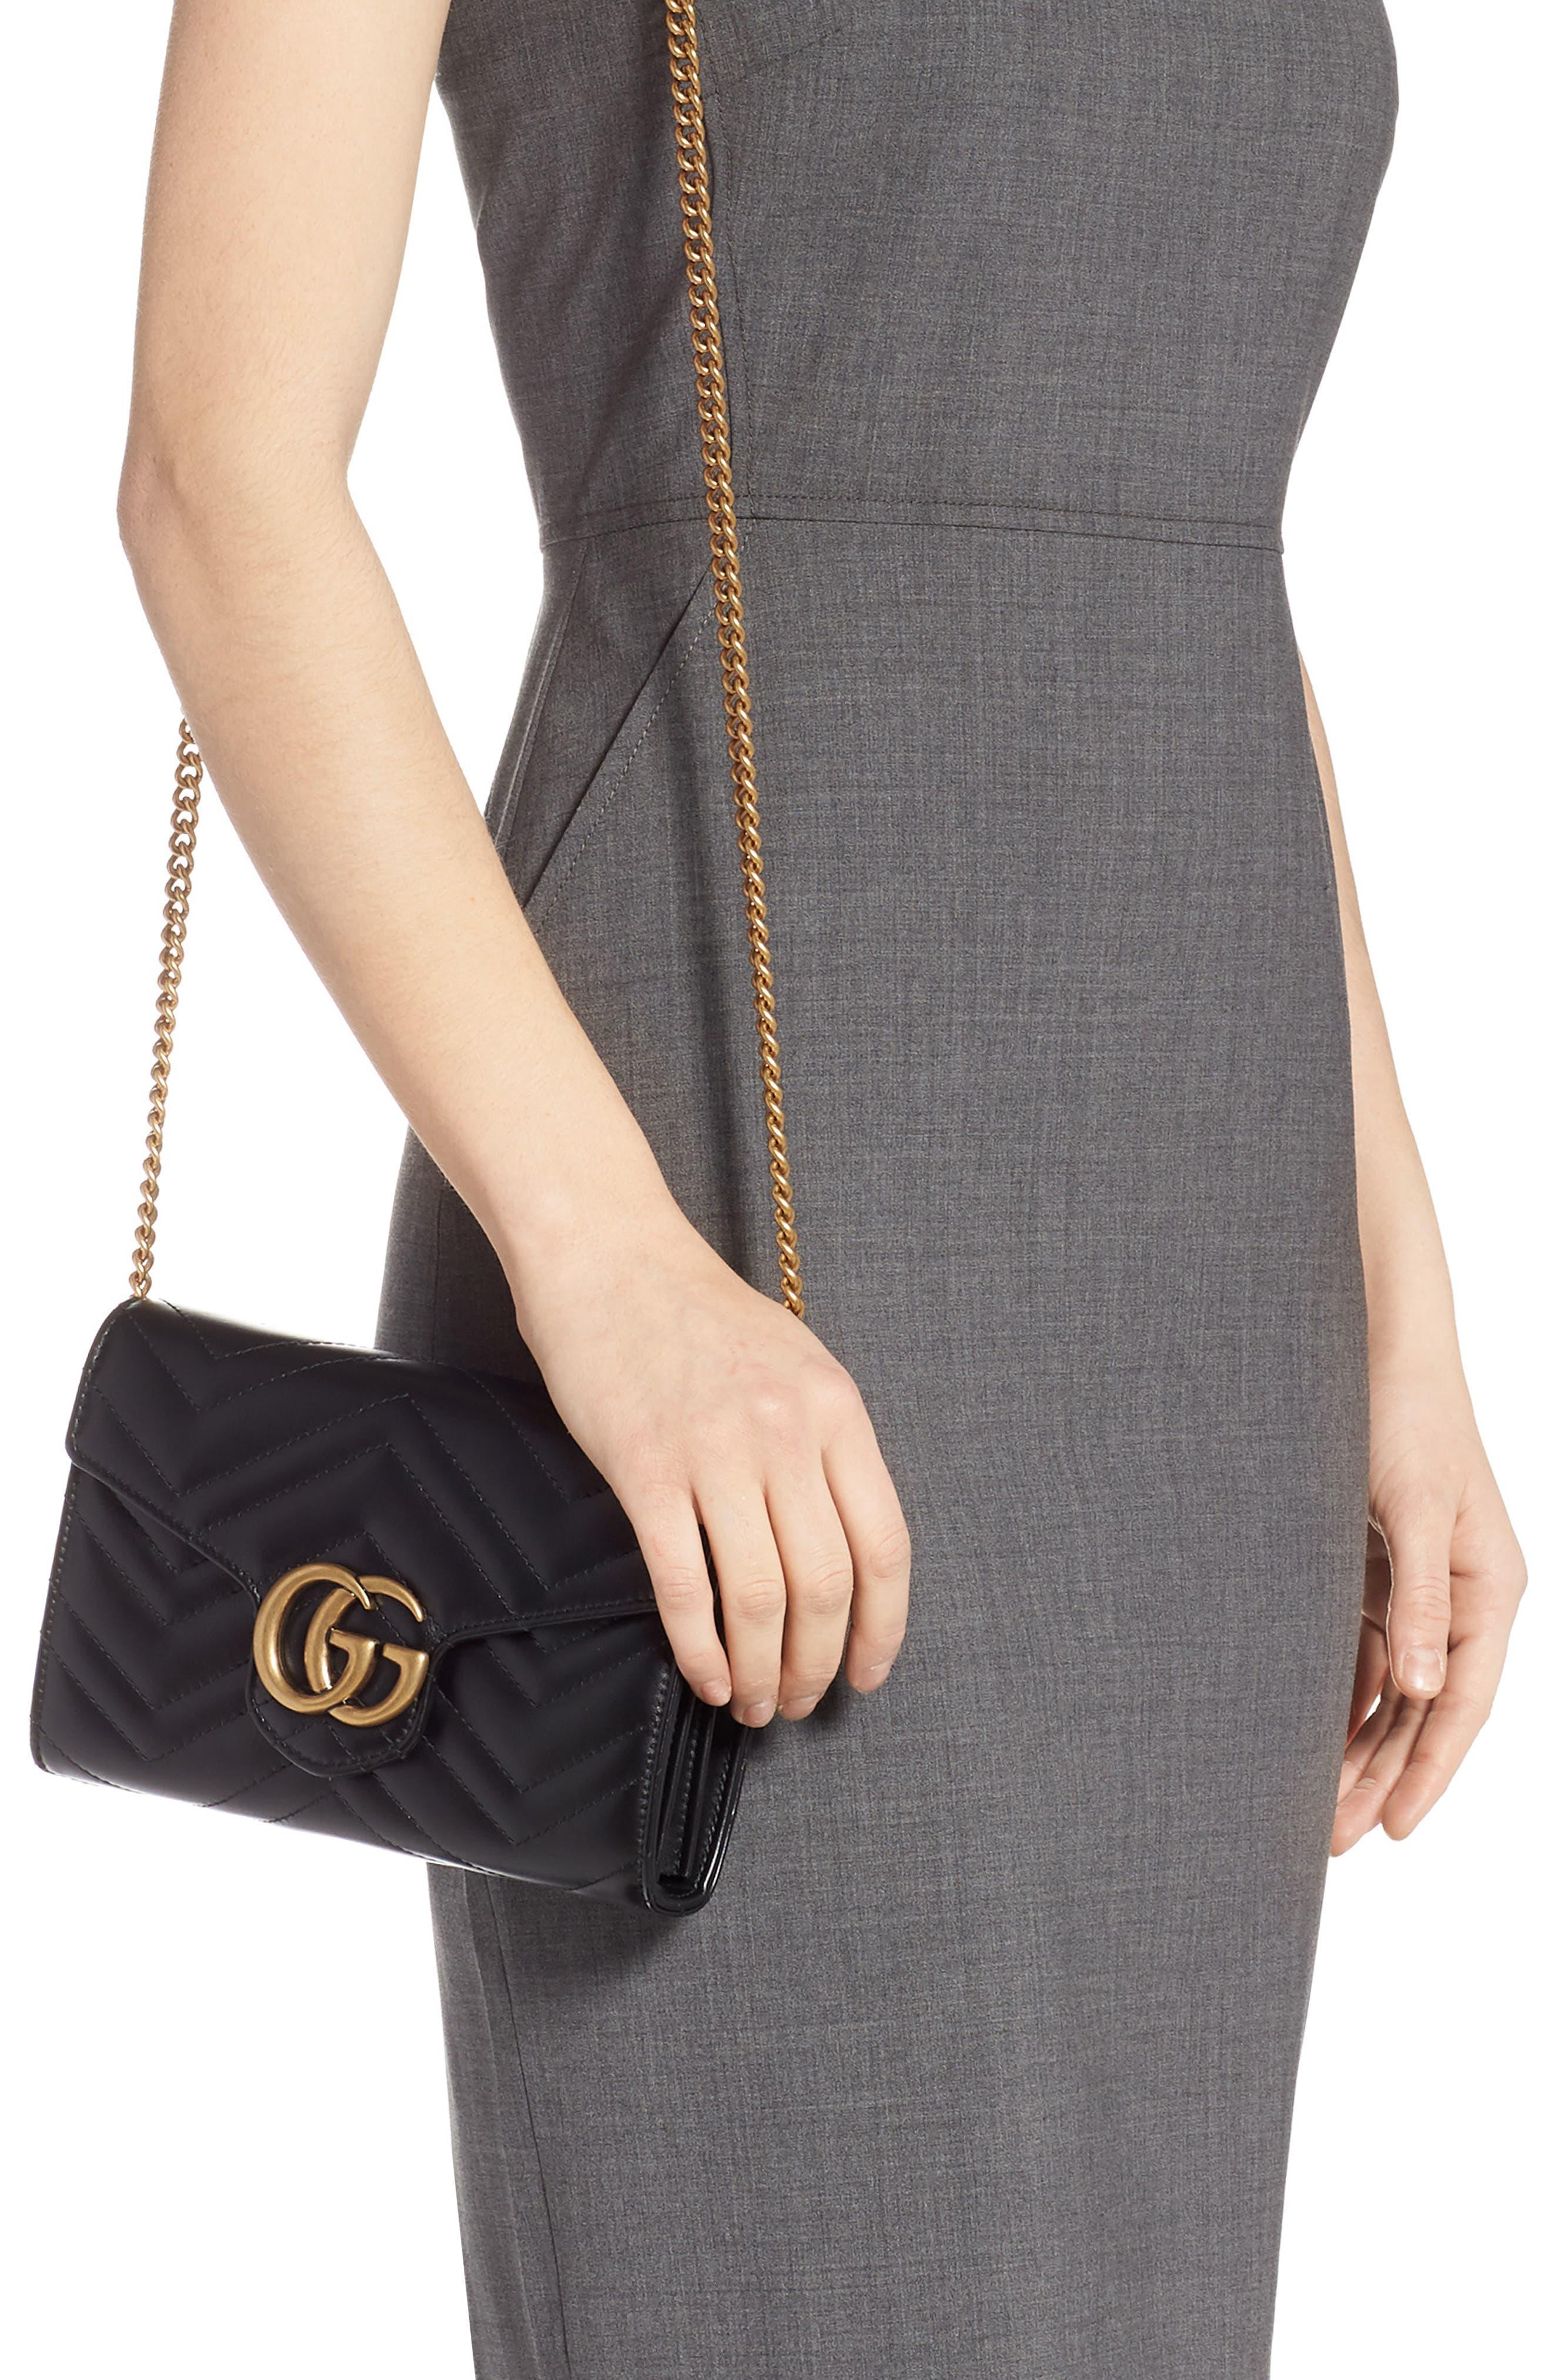 GUCCI, GG Marmont Matelassé Leather Wallet on a Chain, Alternate thumbnail 2, color, NERO